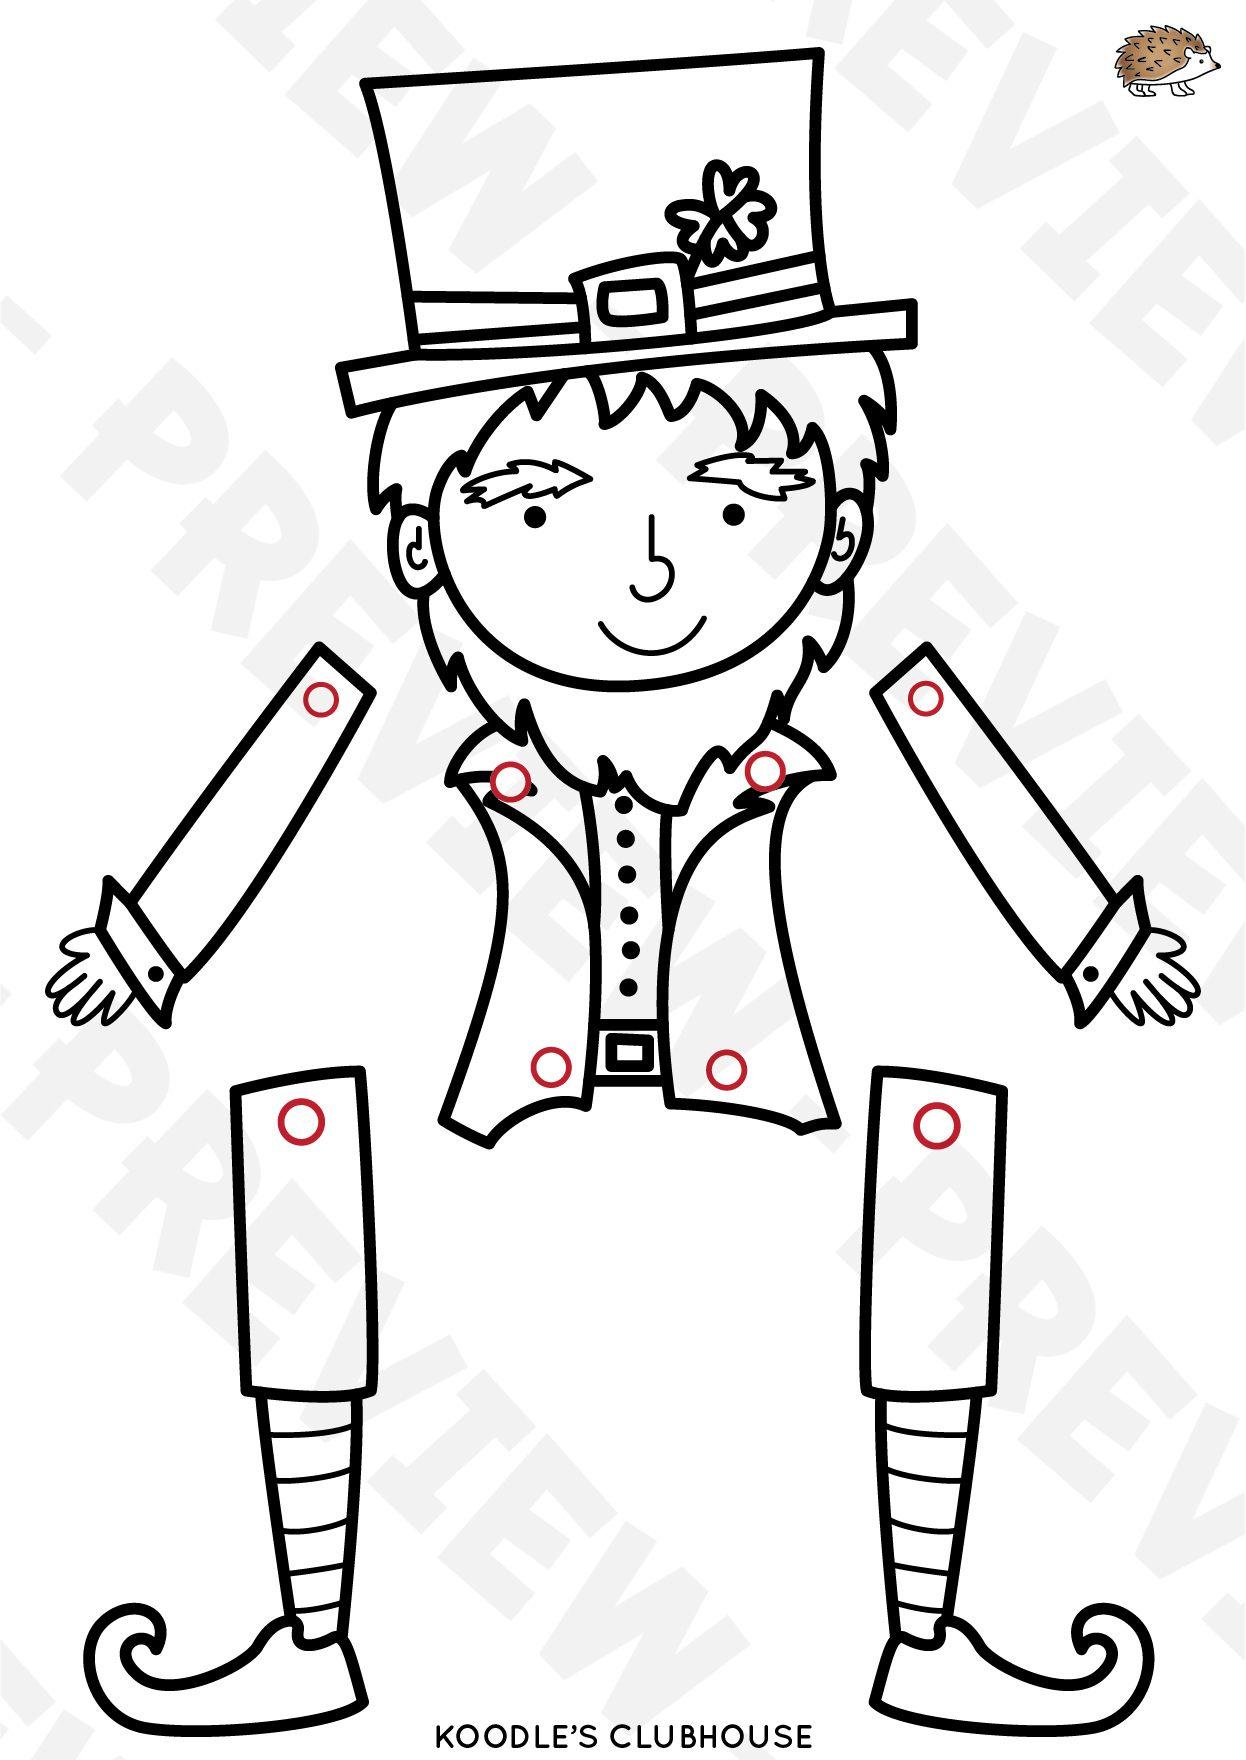 St Patrick S Day Leprechaun Puppet Arts And Crafts St Patricks Day Crafts For Kids St Patrick S Day Crafts Leprechaun Craft Template